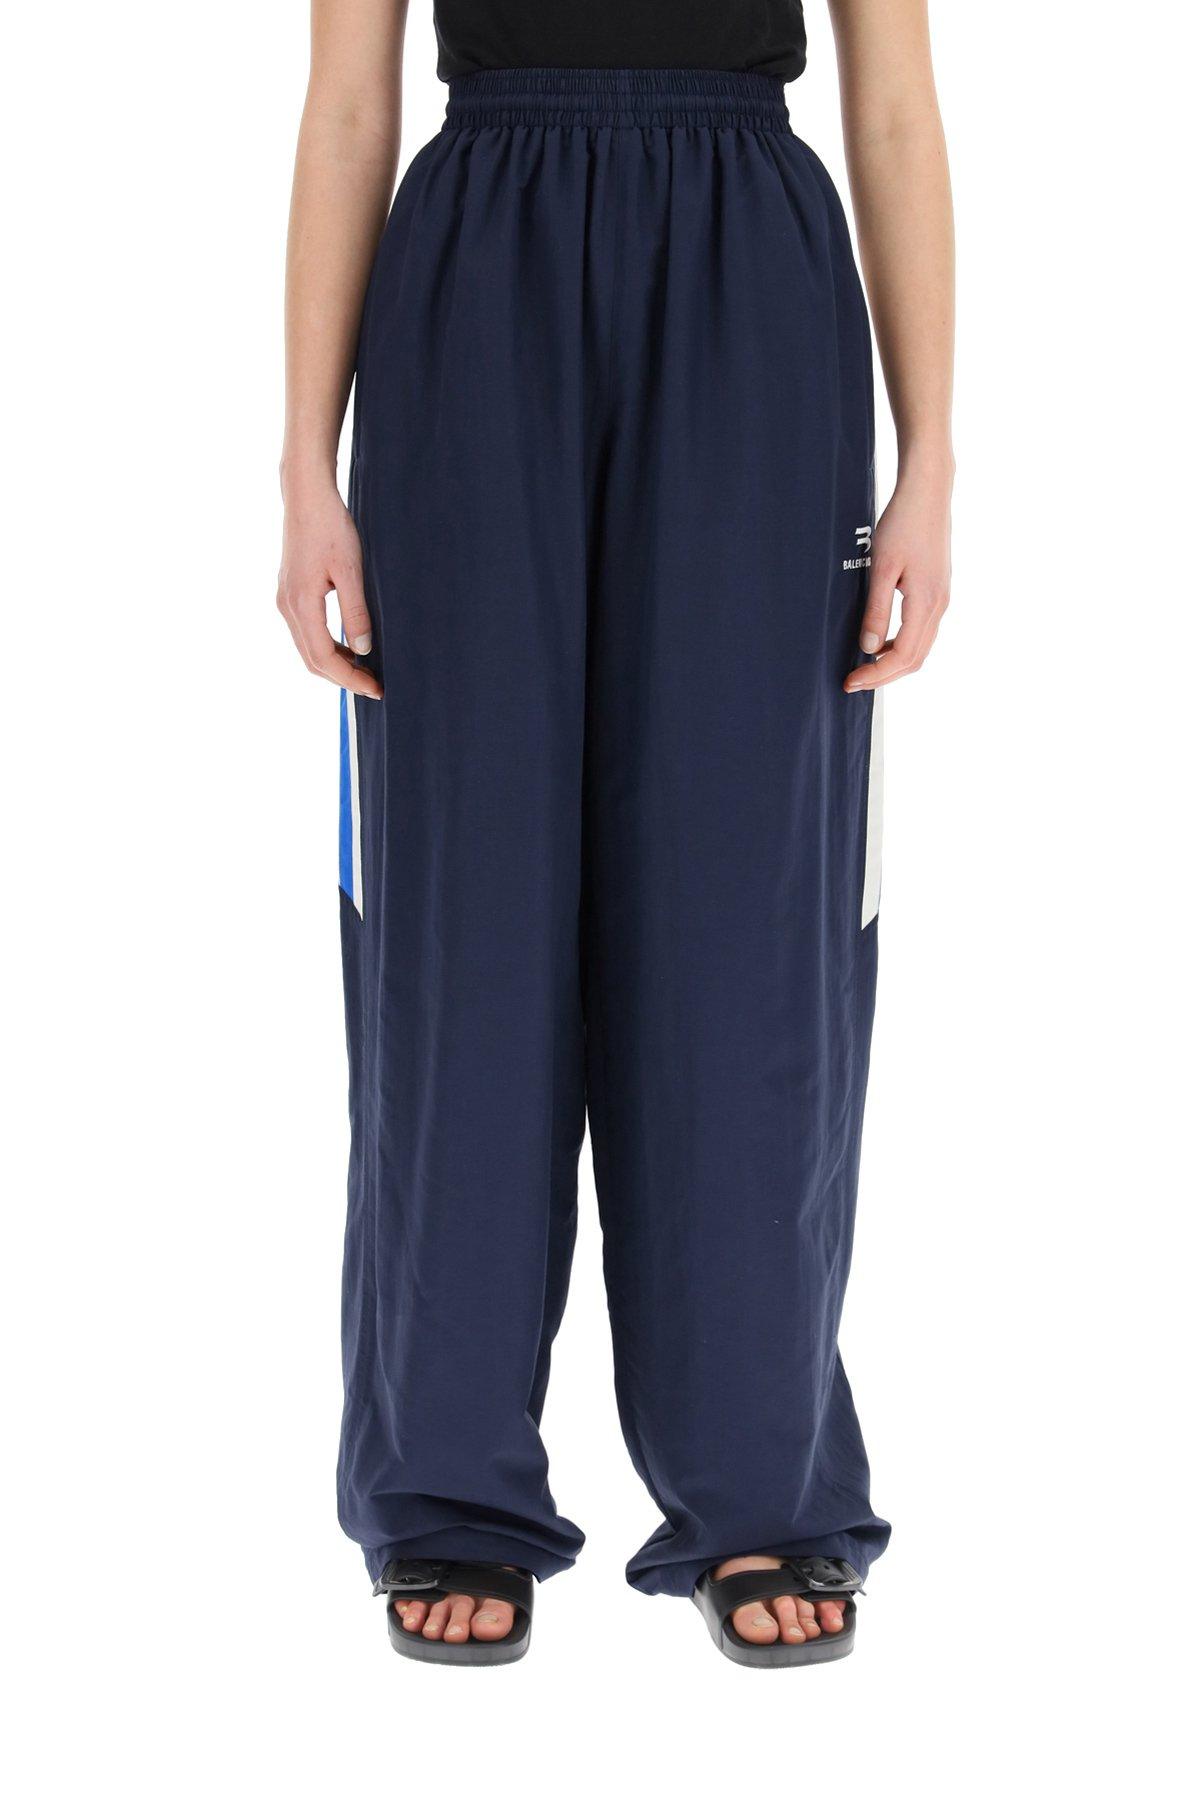 Balenciaga pantaloni tracksuit in nylon